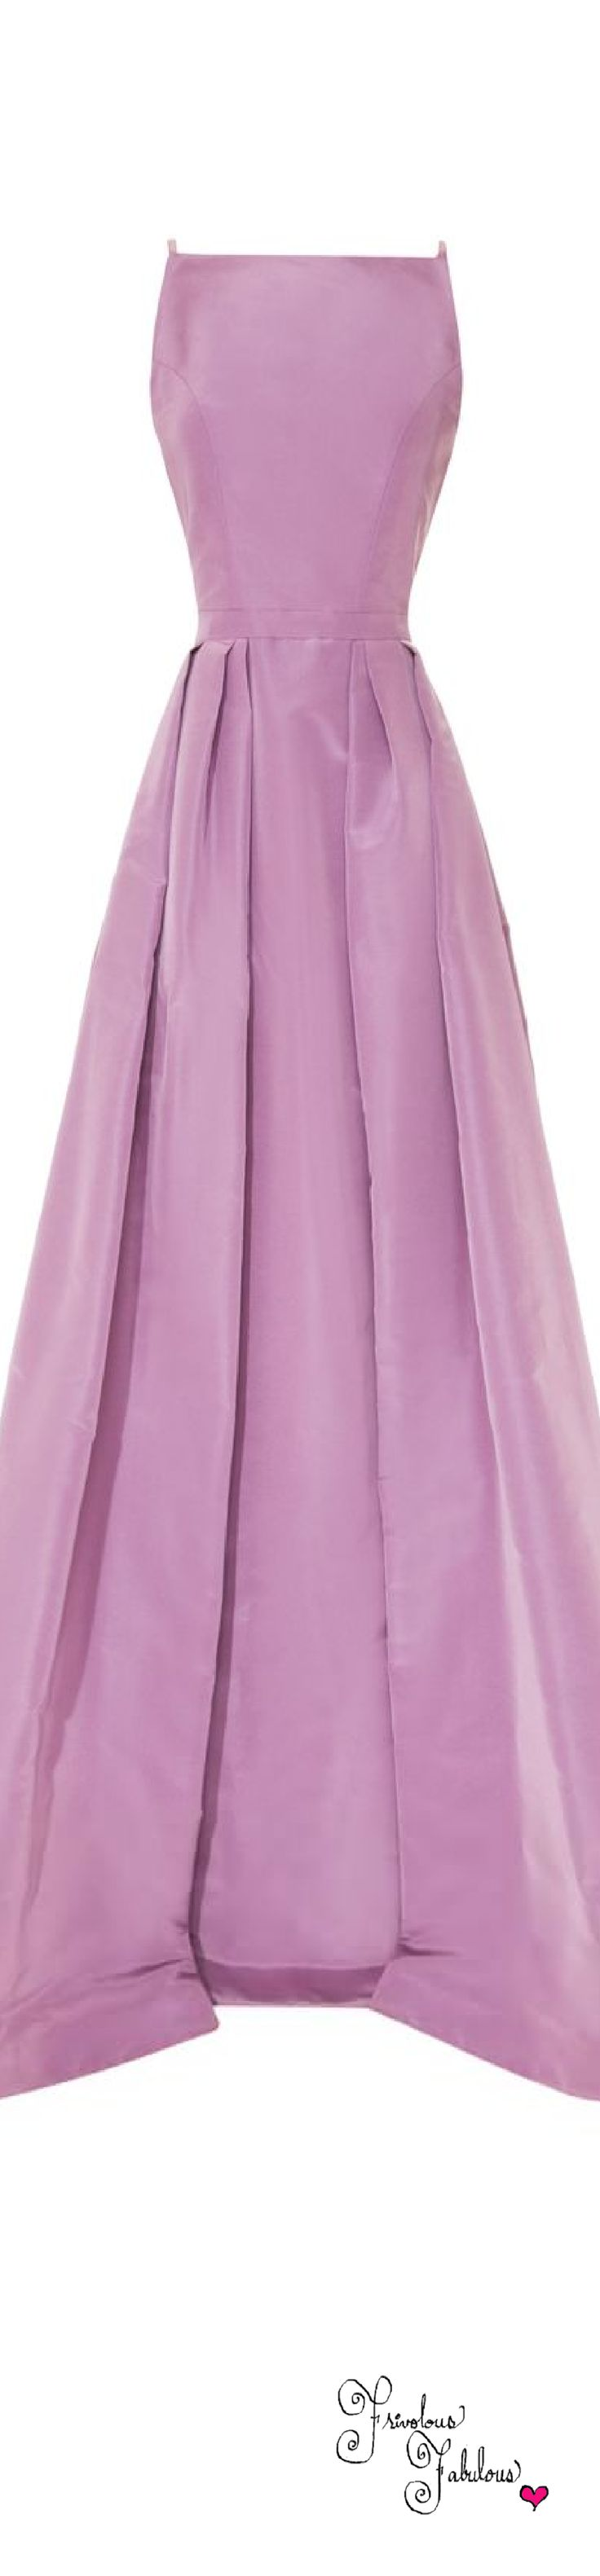 Frivolous Fabulous - Katie Ermilio Laced Tailor Bow Gown Spring Summer 2014